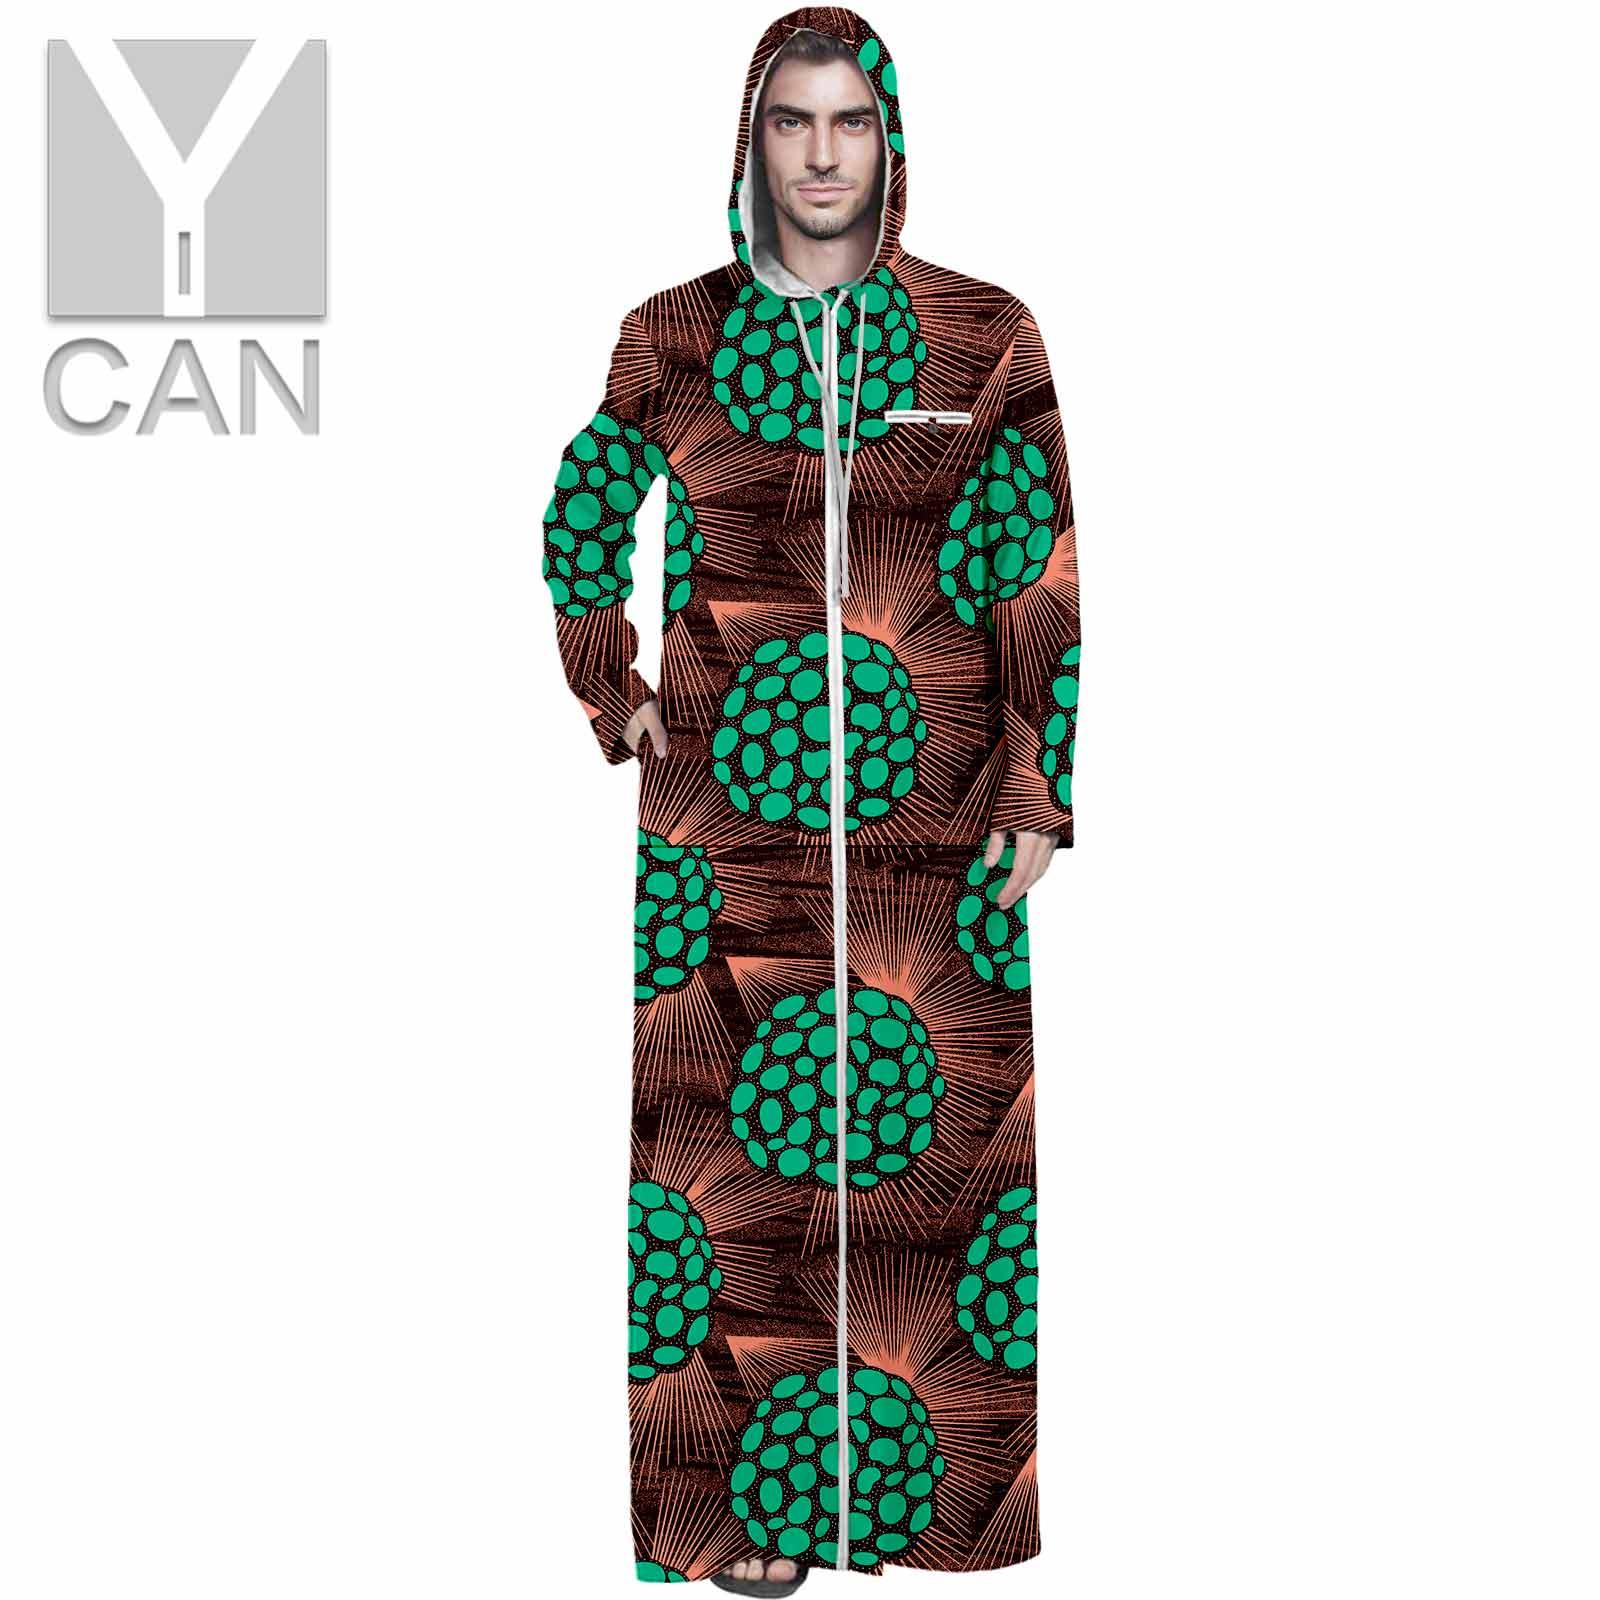 Y-CAN Men Ankara Print Dashiki Hemming  Hooded Long Sleeve Agbada Loose Long Coats Texture Fashion Comfortble Robes Y211001